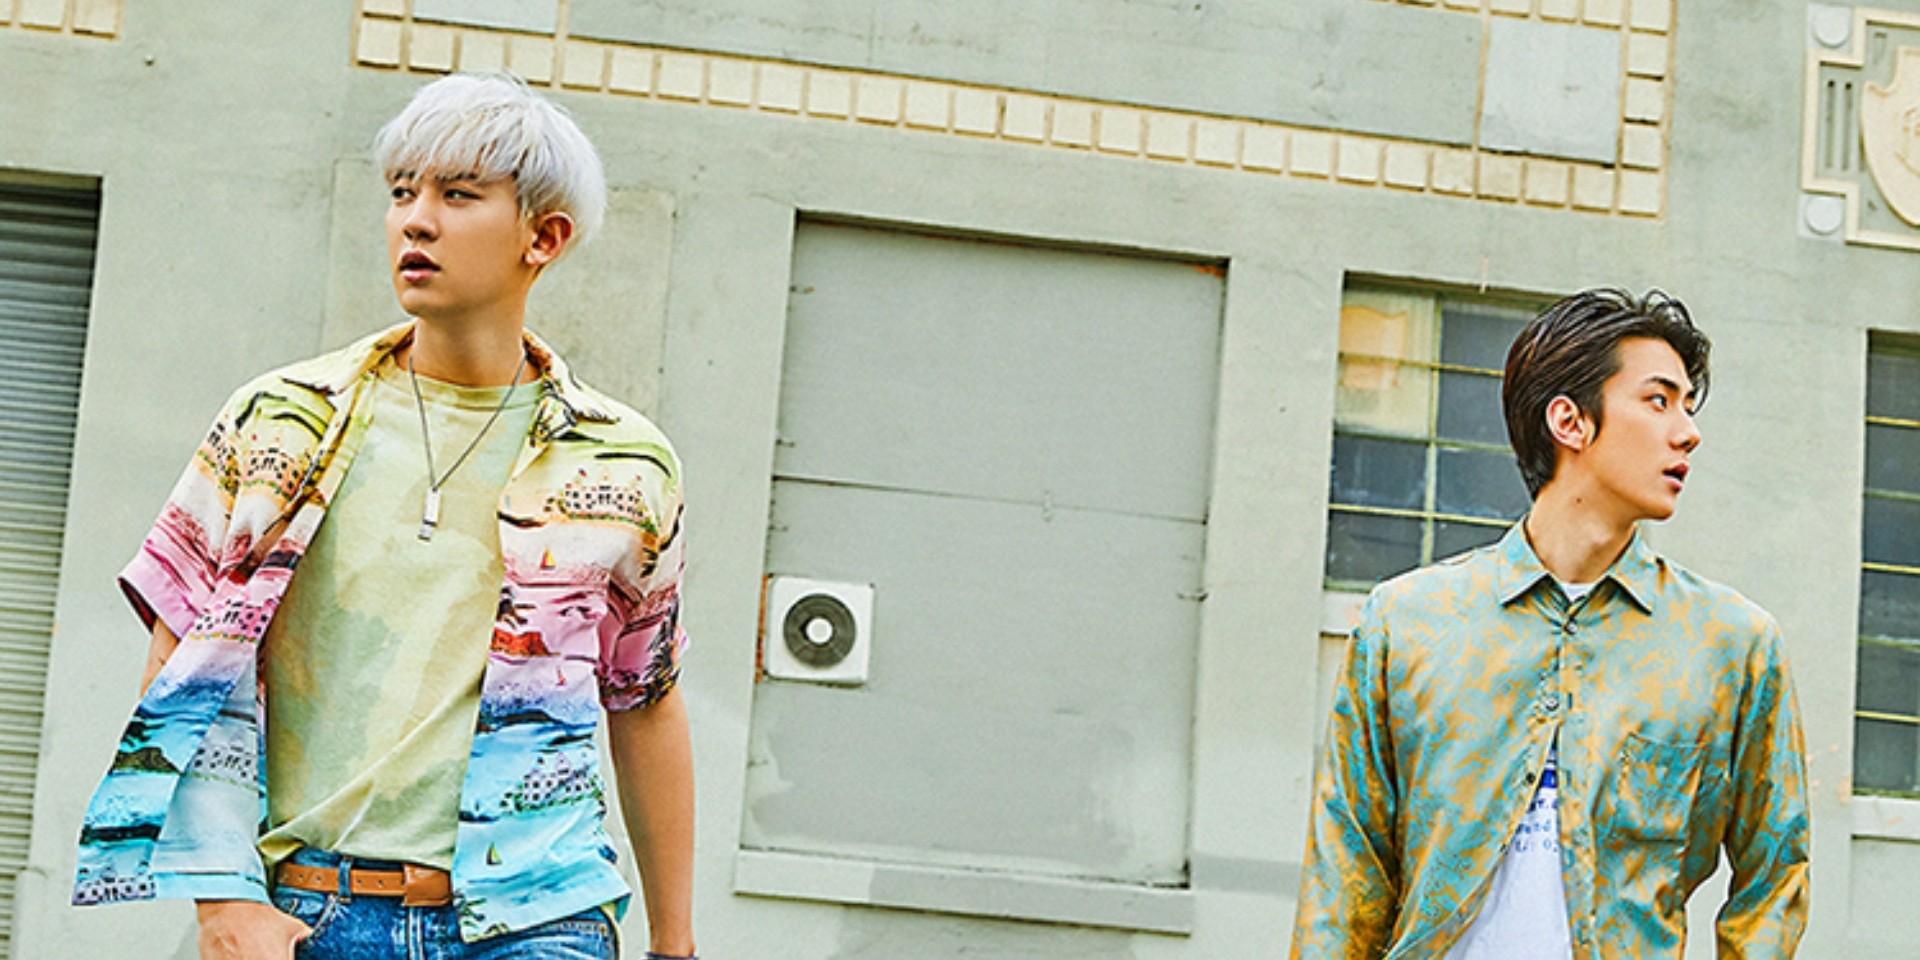 EXO-SC releases debut mini album, What a life – listen